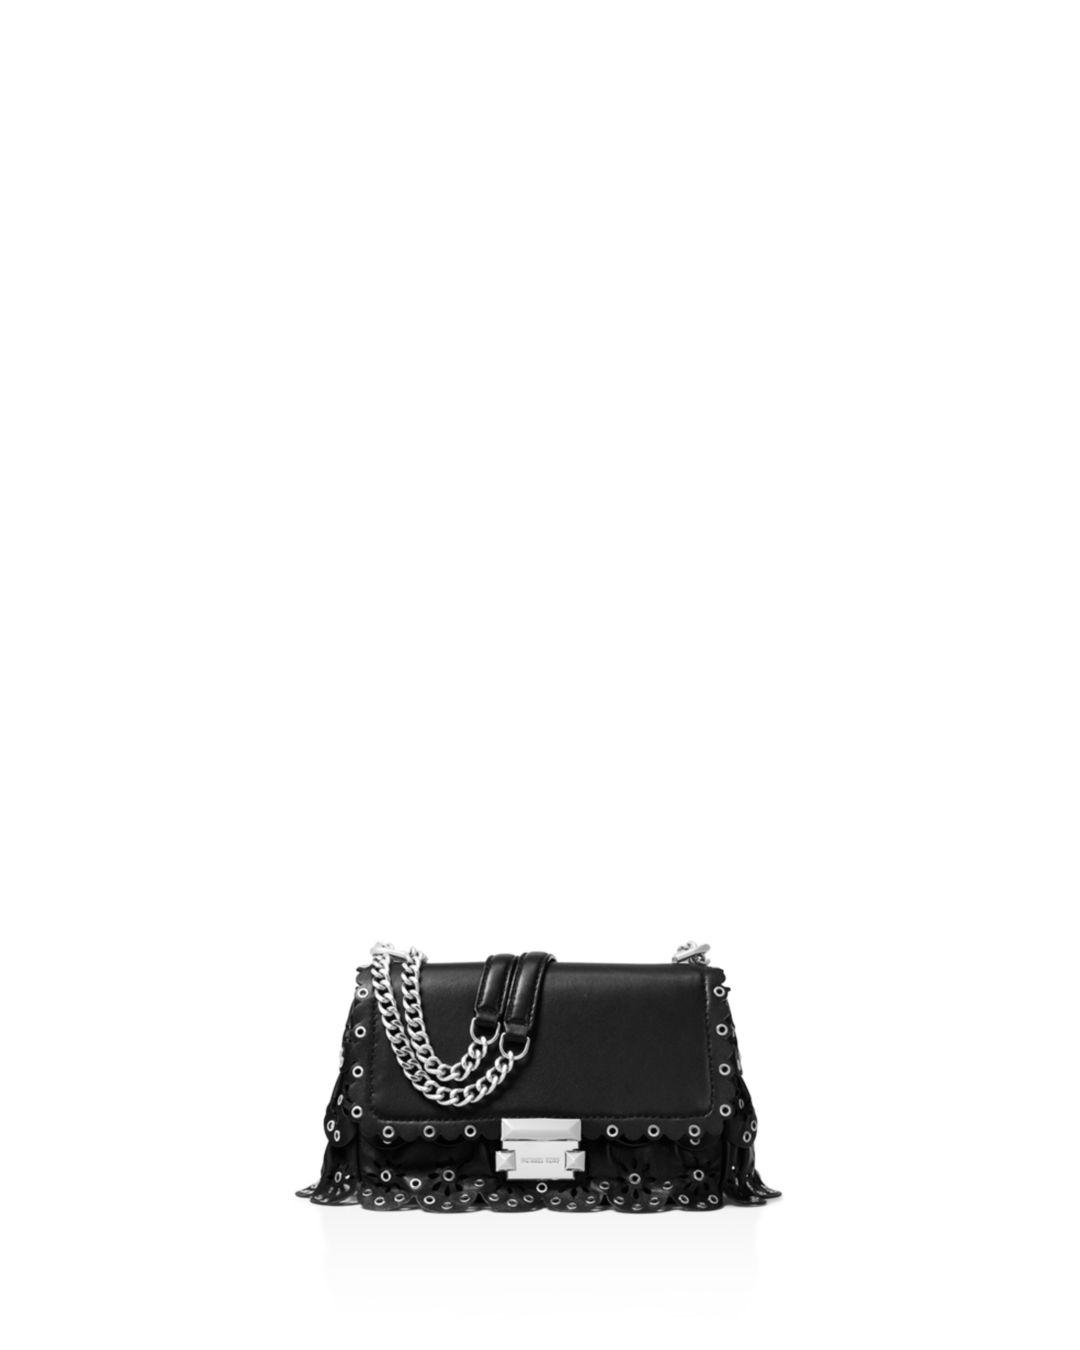 b95c029f05cba MICHAEL Michael Kors. Women s Black Michael Kors Sloan Small Leather Chain  Shoulder Bag